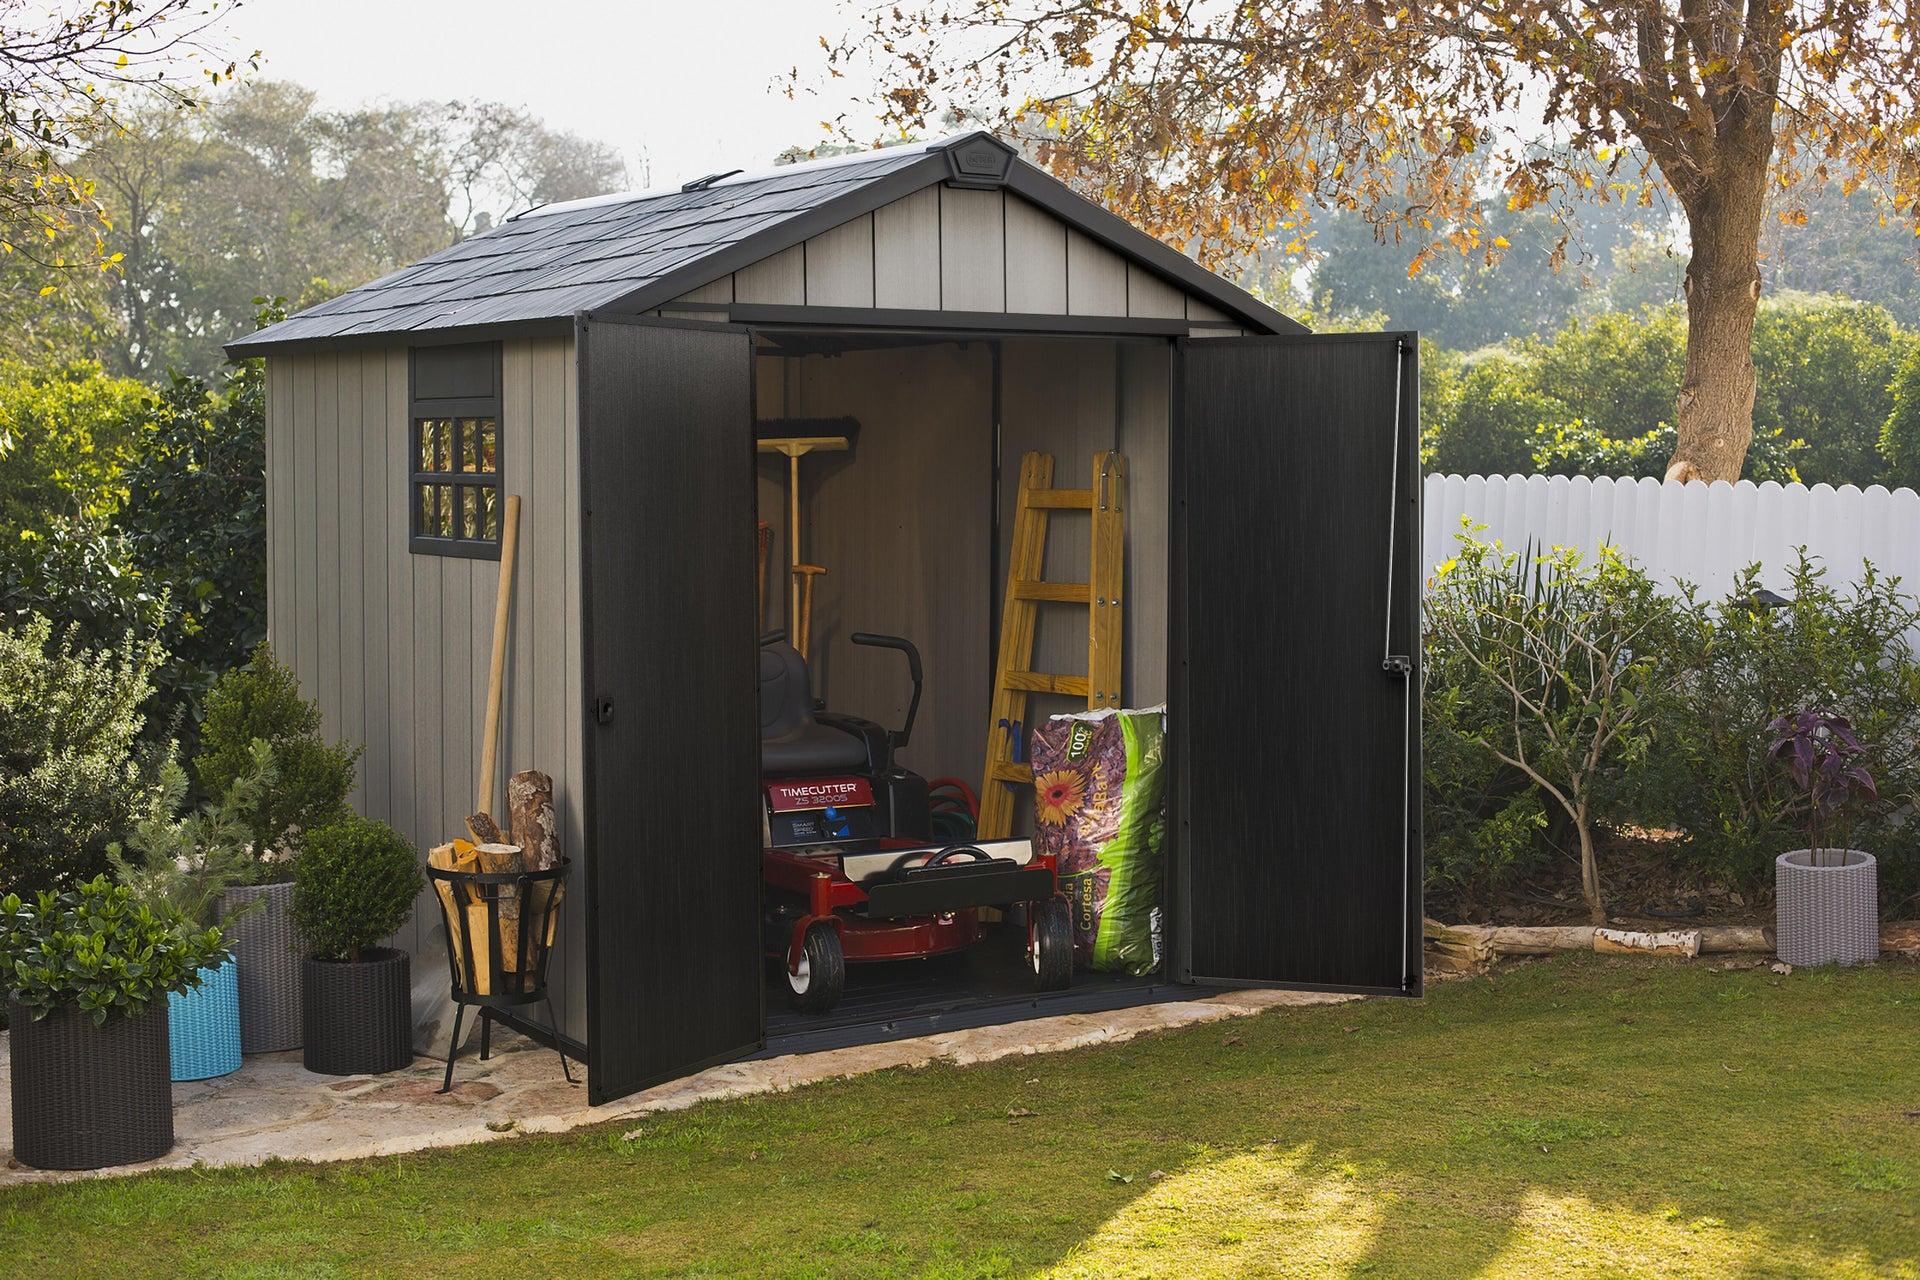 Casetta da giardino in polipropilene Oakland 759 KETER, superficie interna 5.25 m² e spessore parete 20 mm - 6